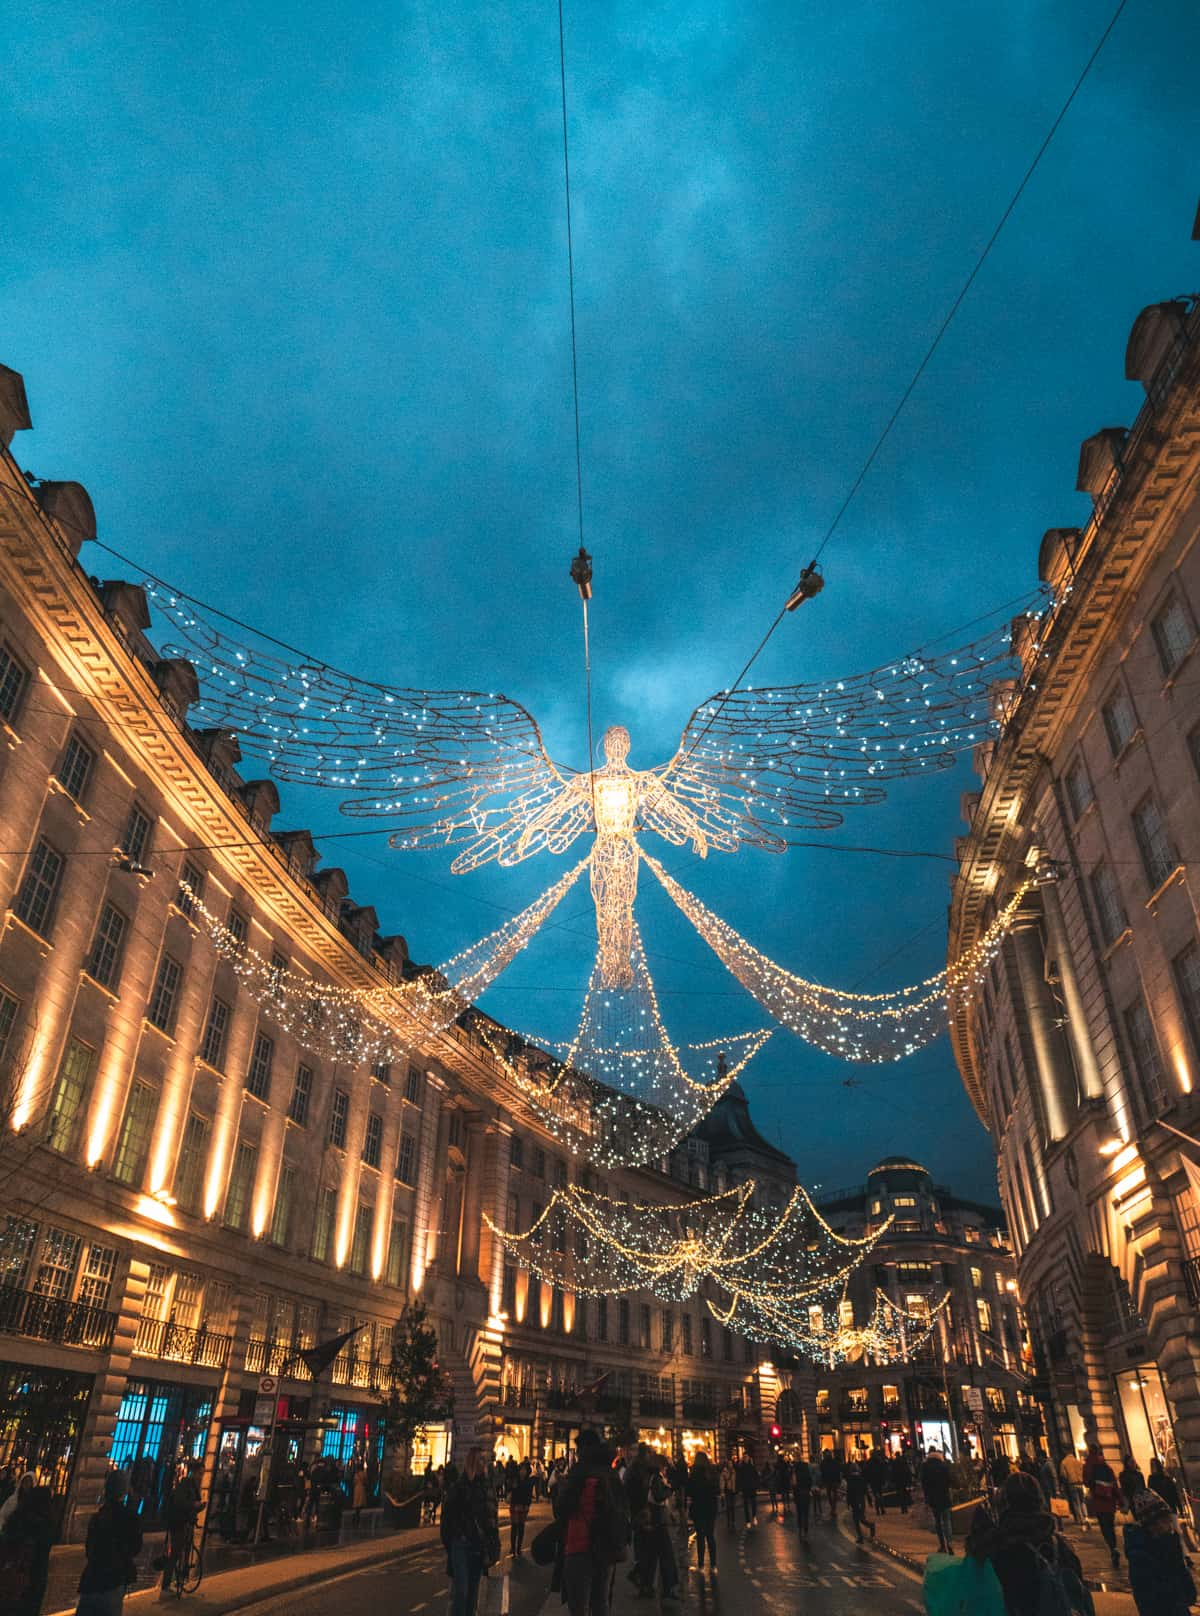 Angel lights on Regents Street with people walking by